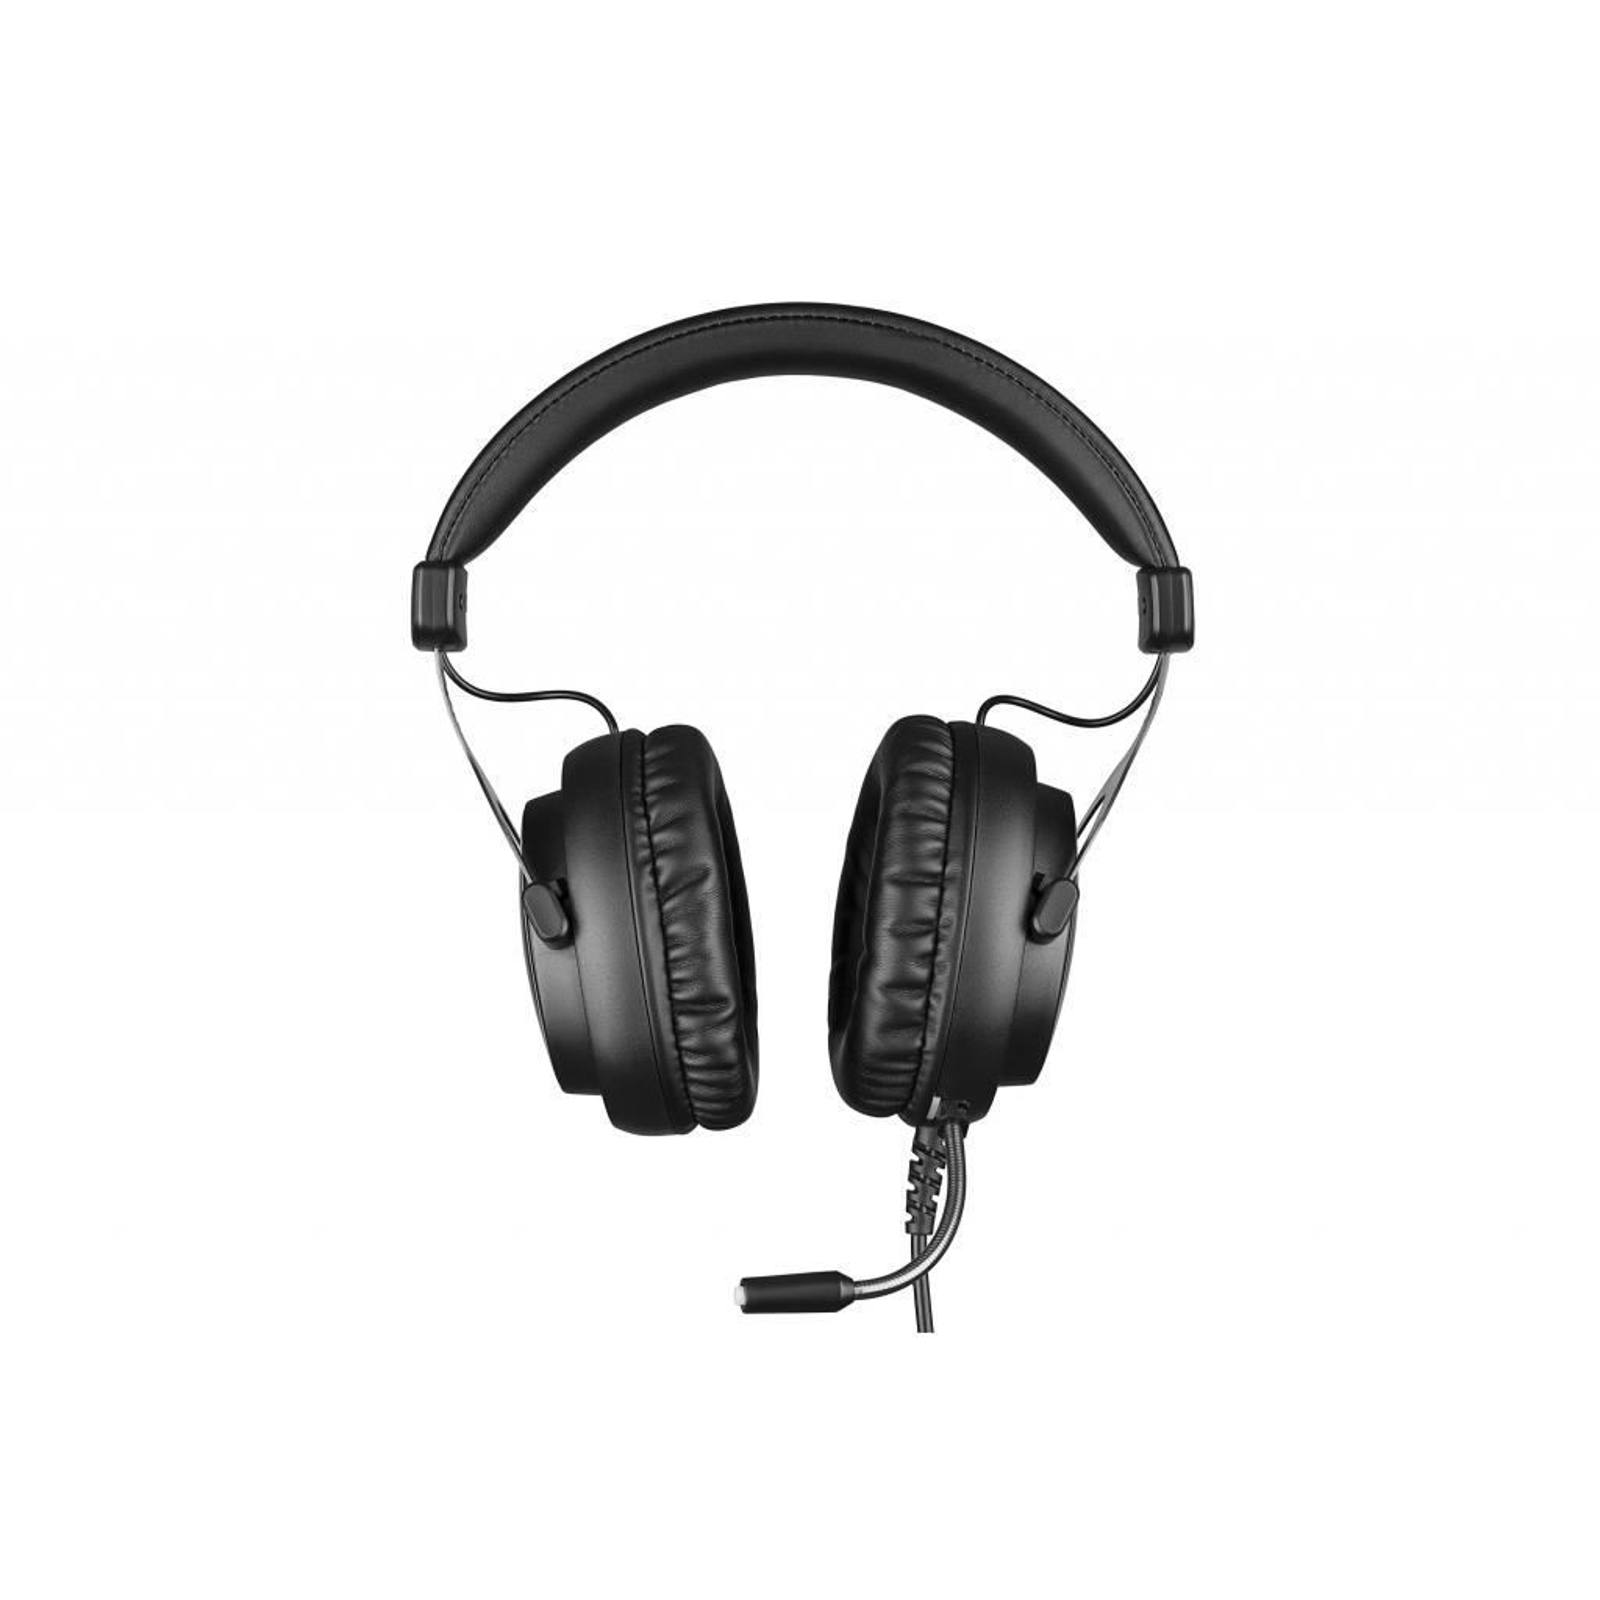 Навушники 2E Gaming HG320 LED Black (2E-HG320B) зображення 4